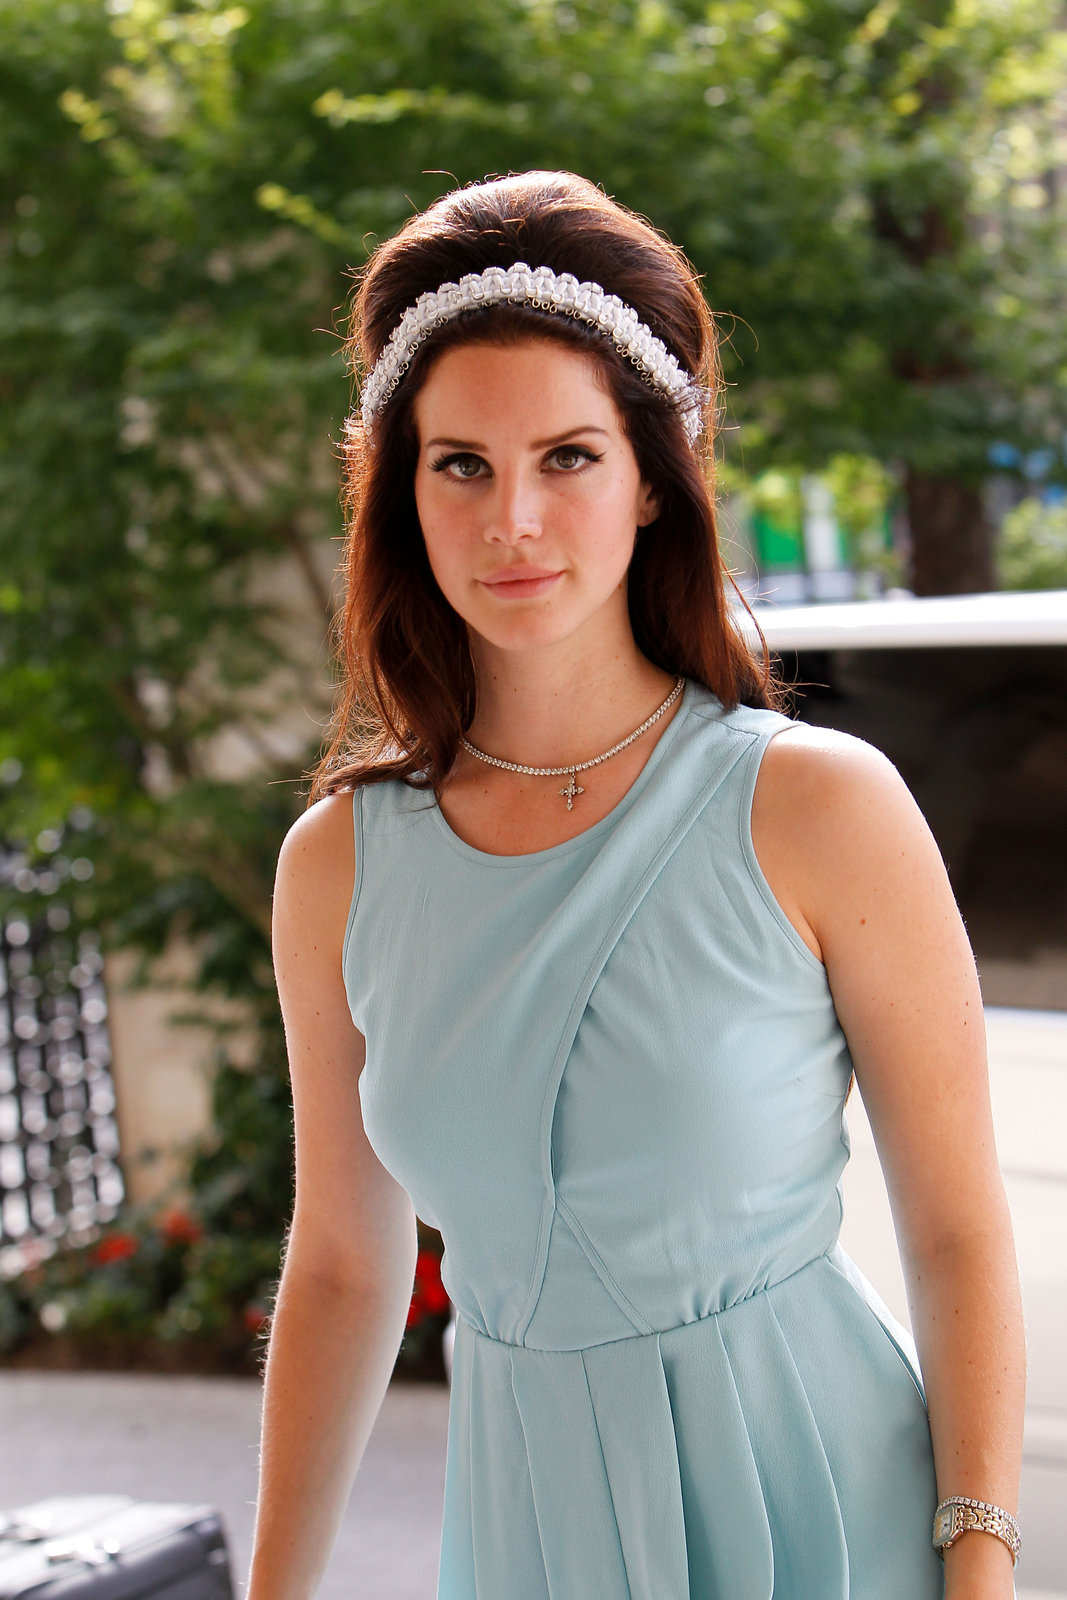 Lana Del Rey By Chris Nicholls For Fashion Magazine: Lana Del Rey